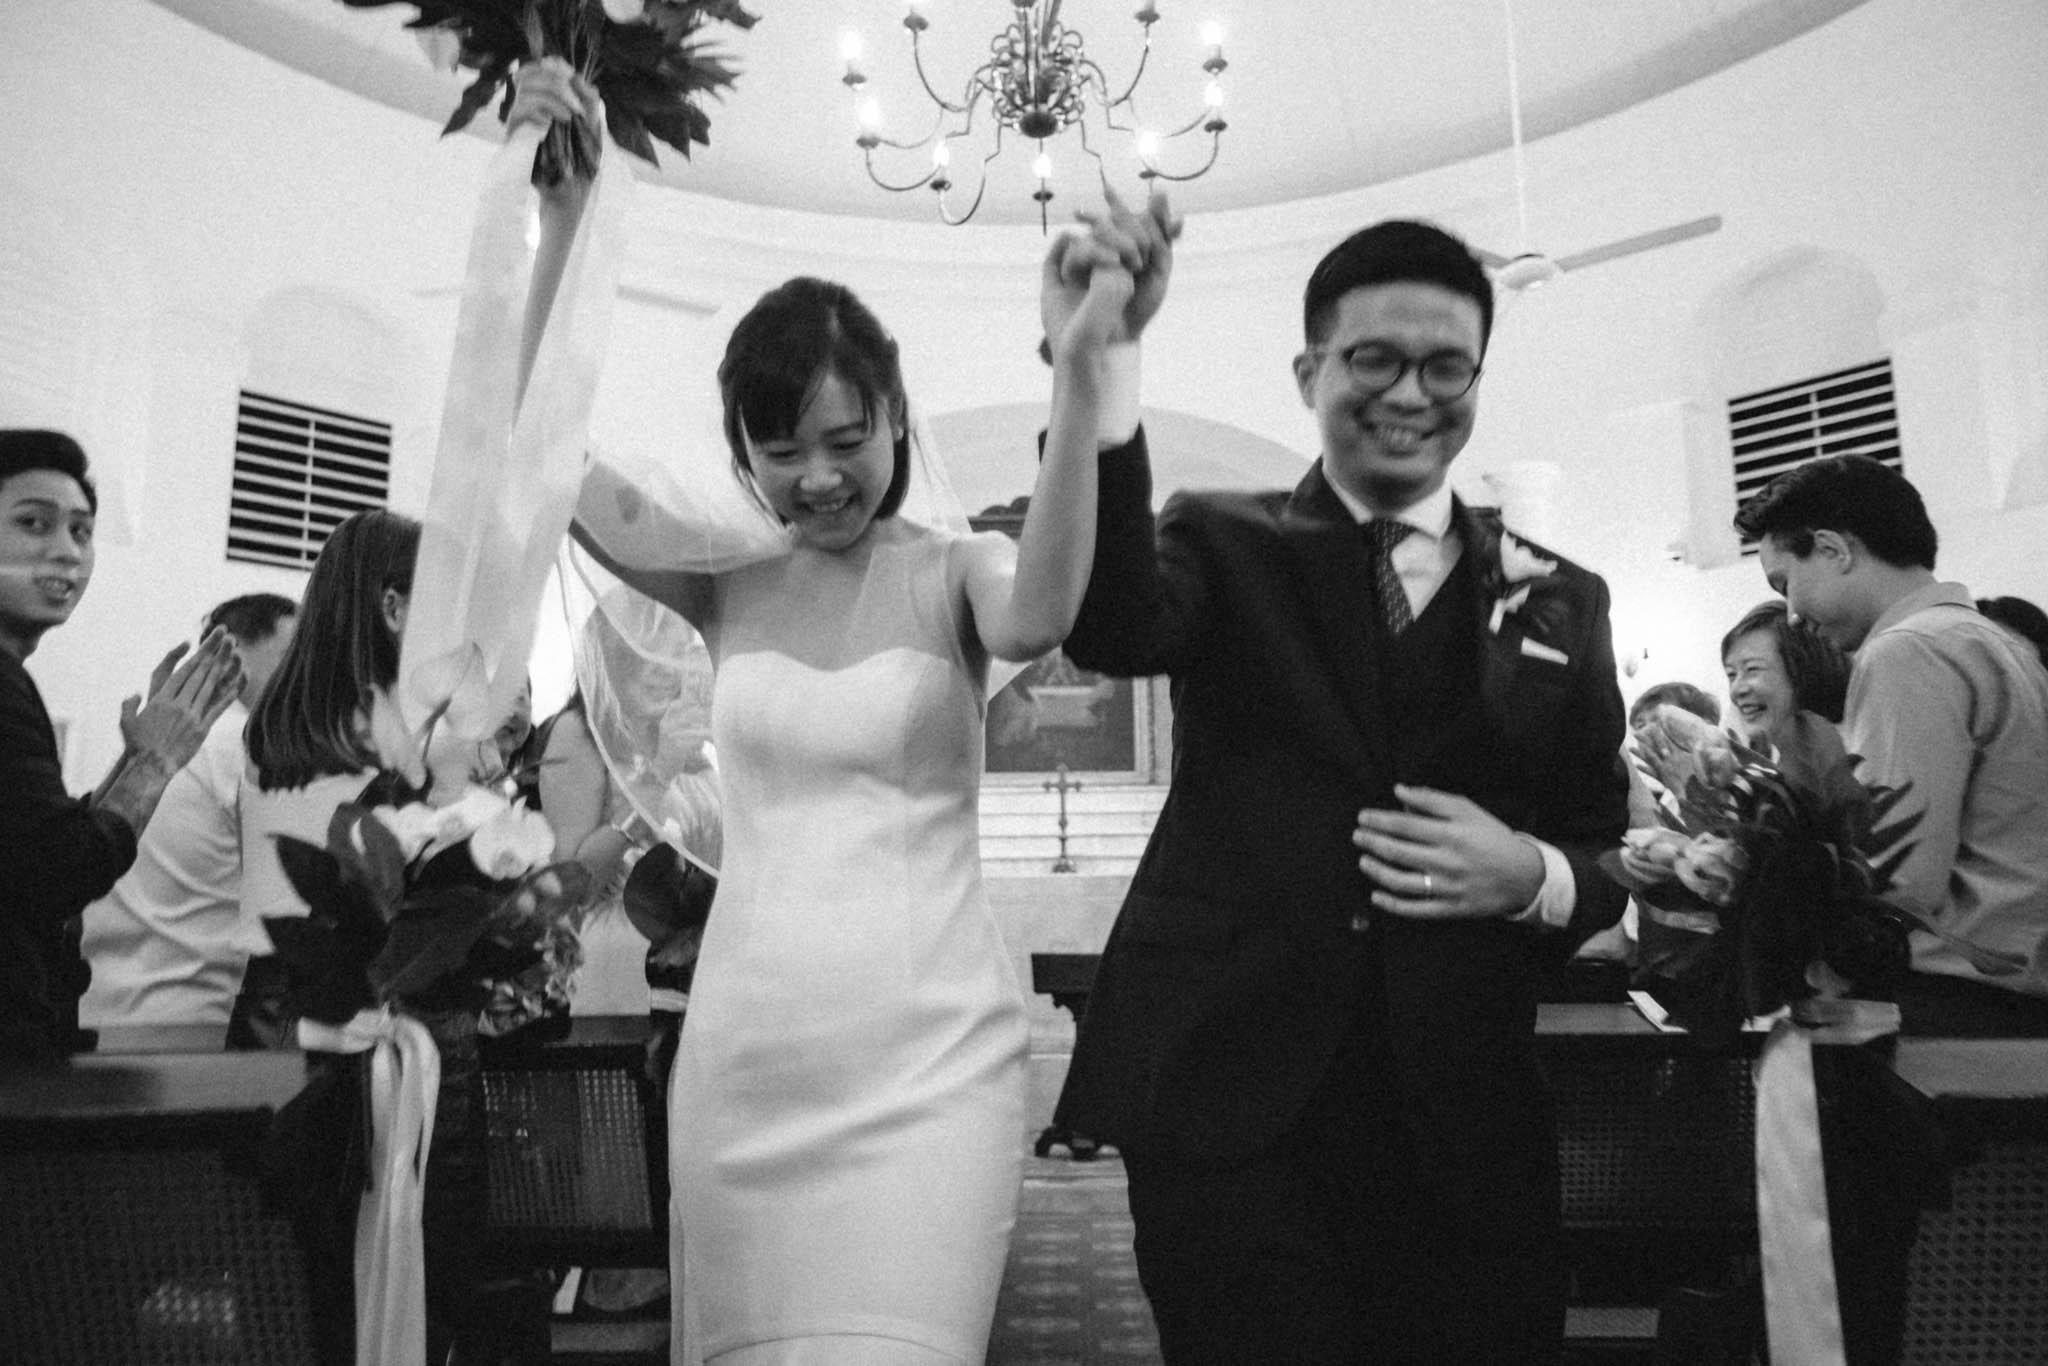 singapore-wedding-photographer-sentosa-foc-mark-eleanor-23.jpg